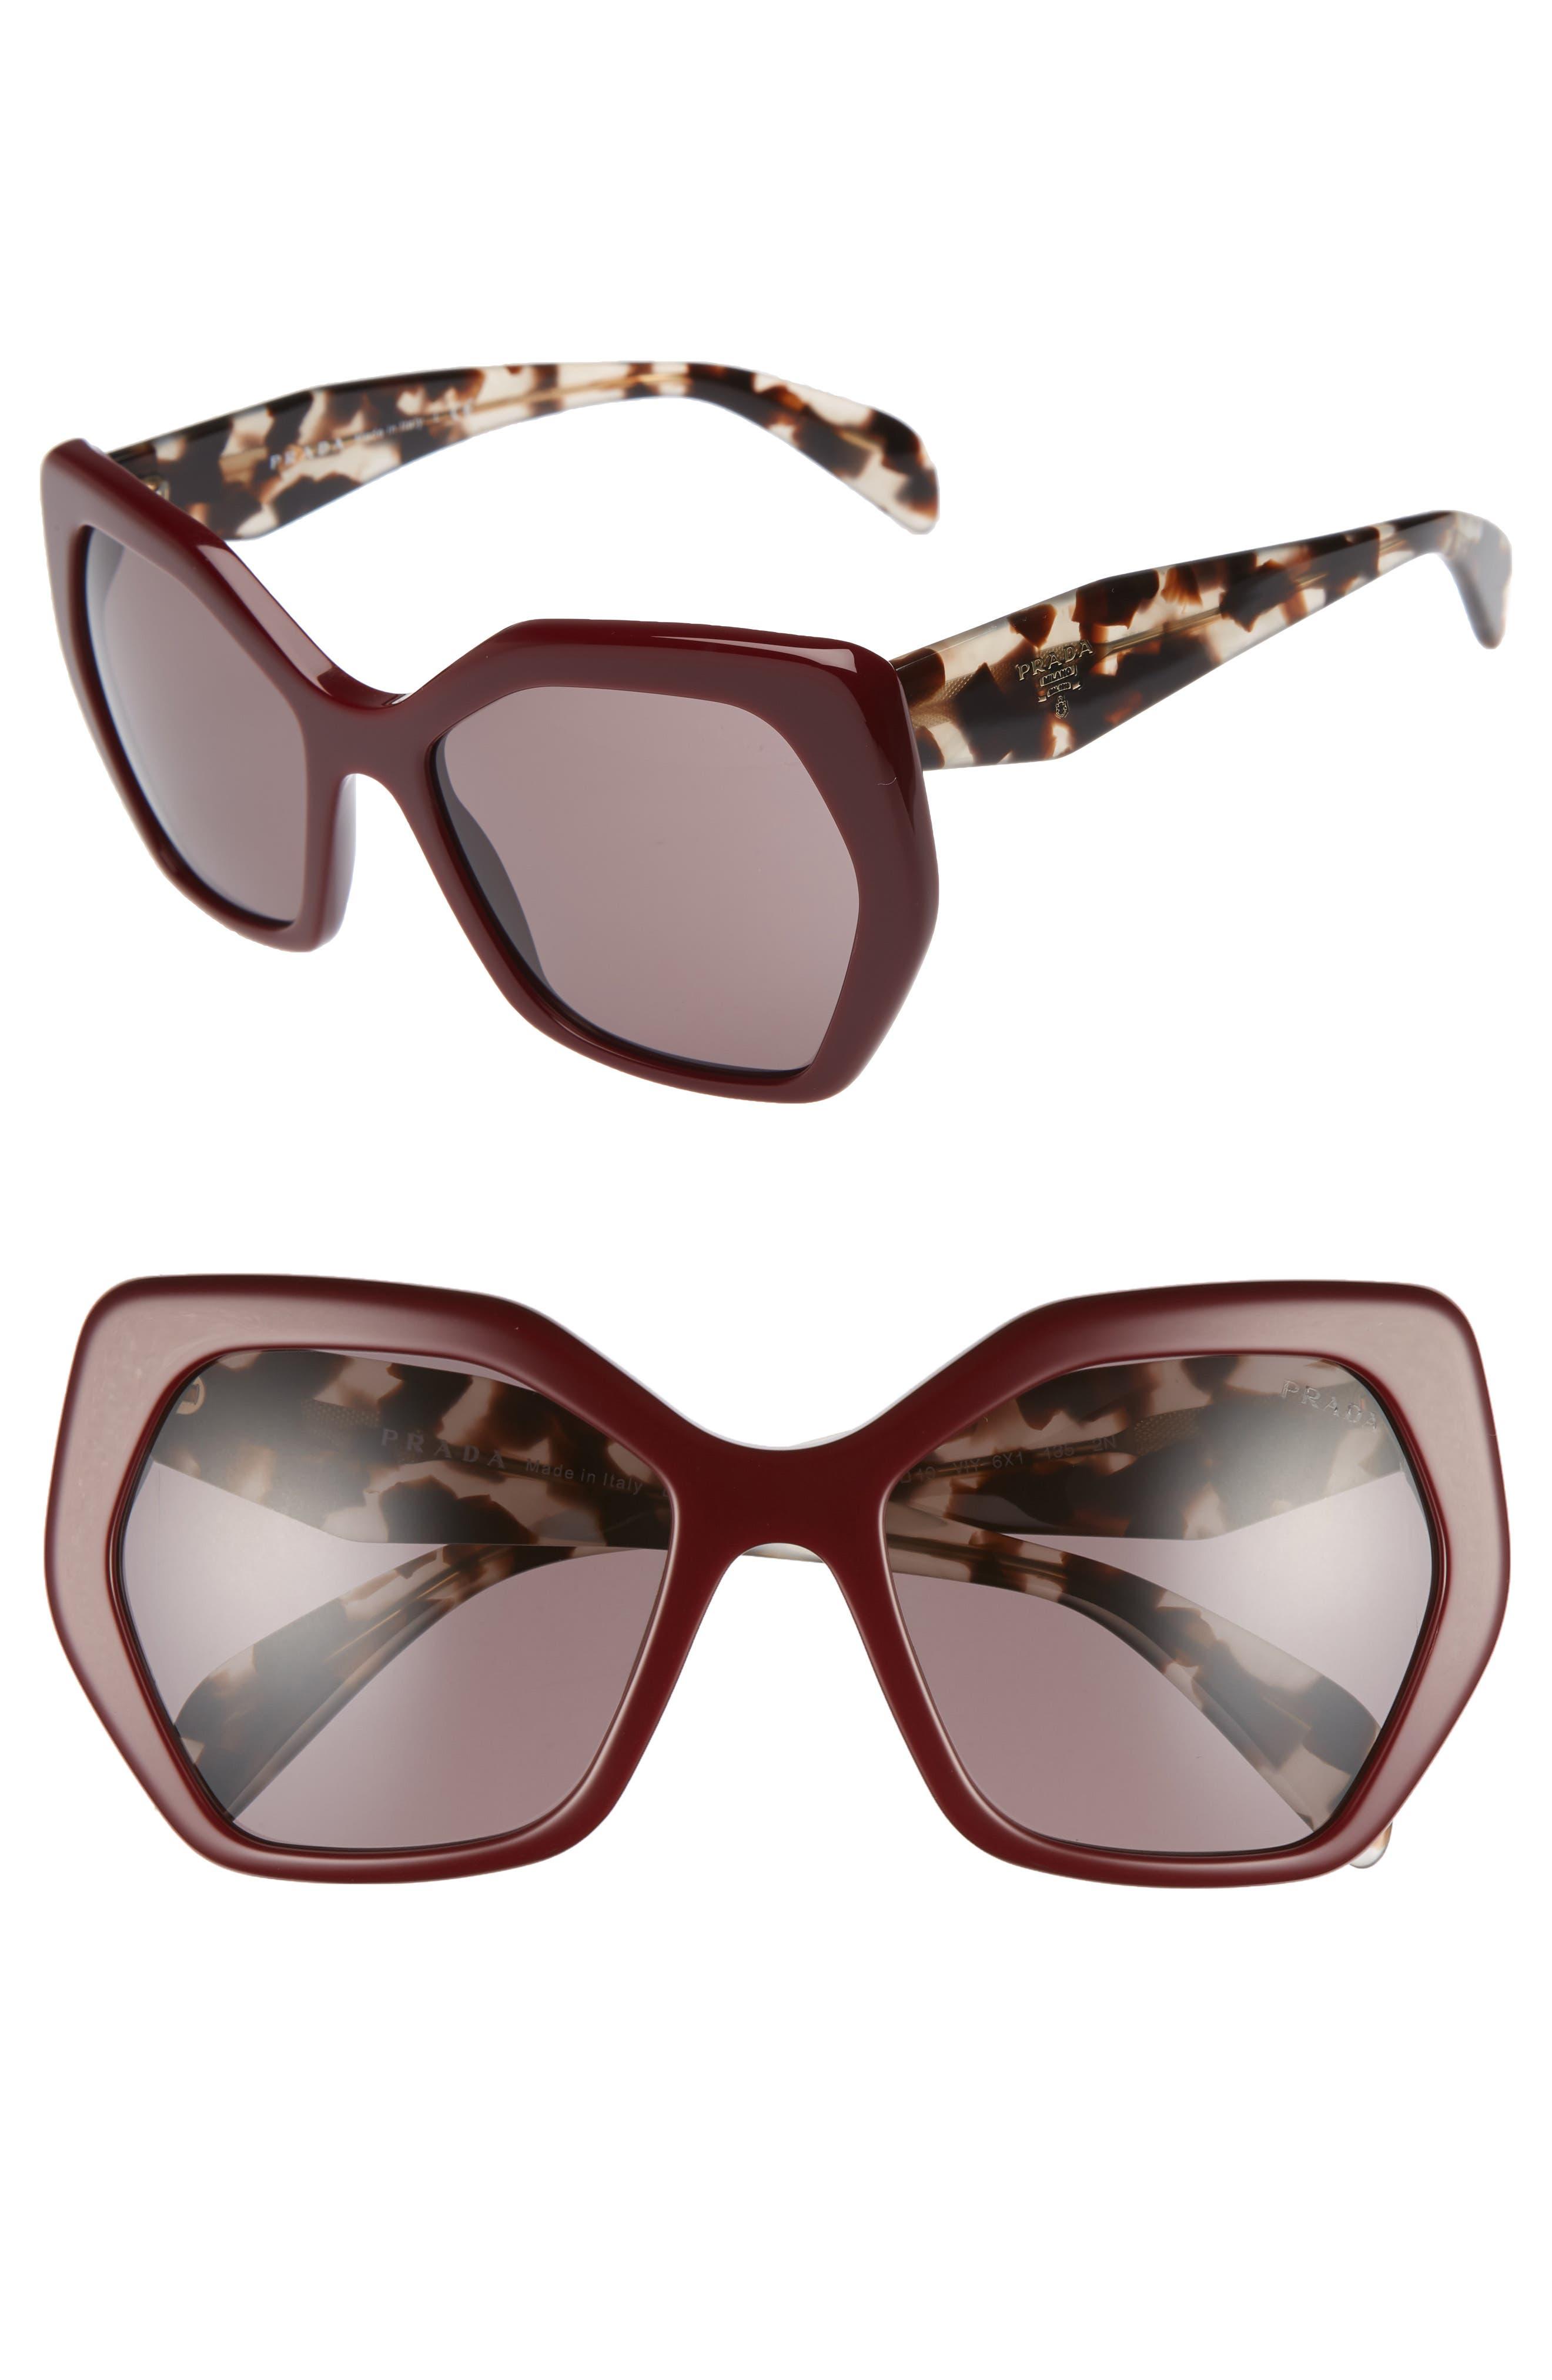 Heritage 56mm Sunglasses,                             Main thumbnail 1, color,                             Maroon